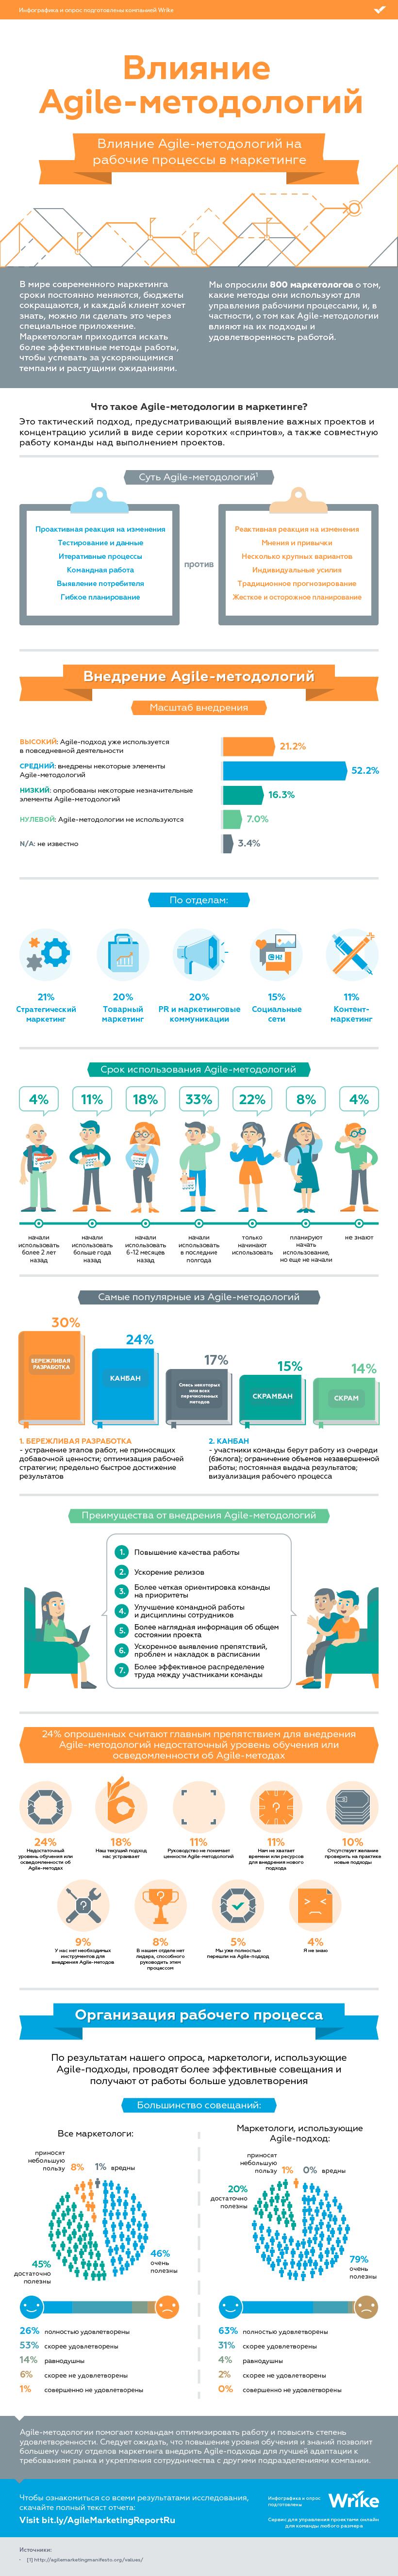 wrike_infographic_The_Agile_Effect_RU